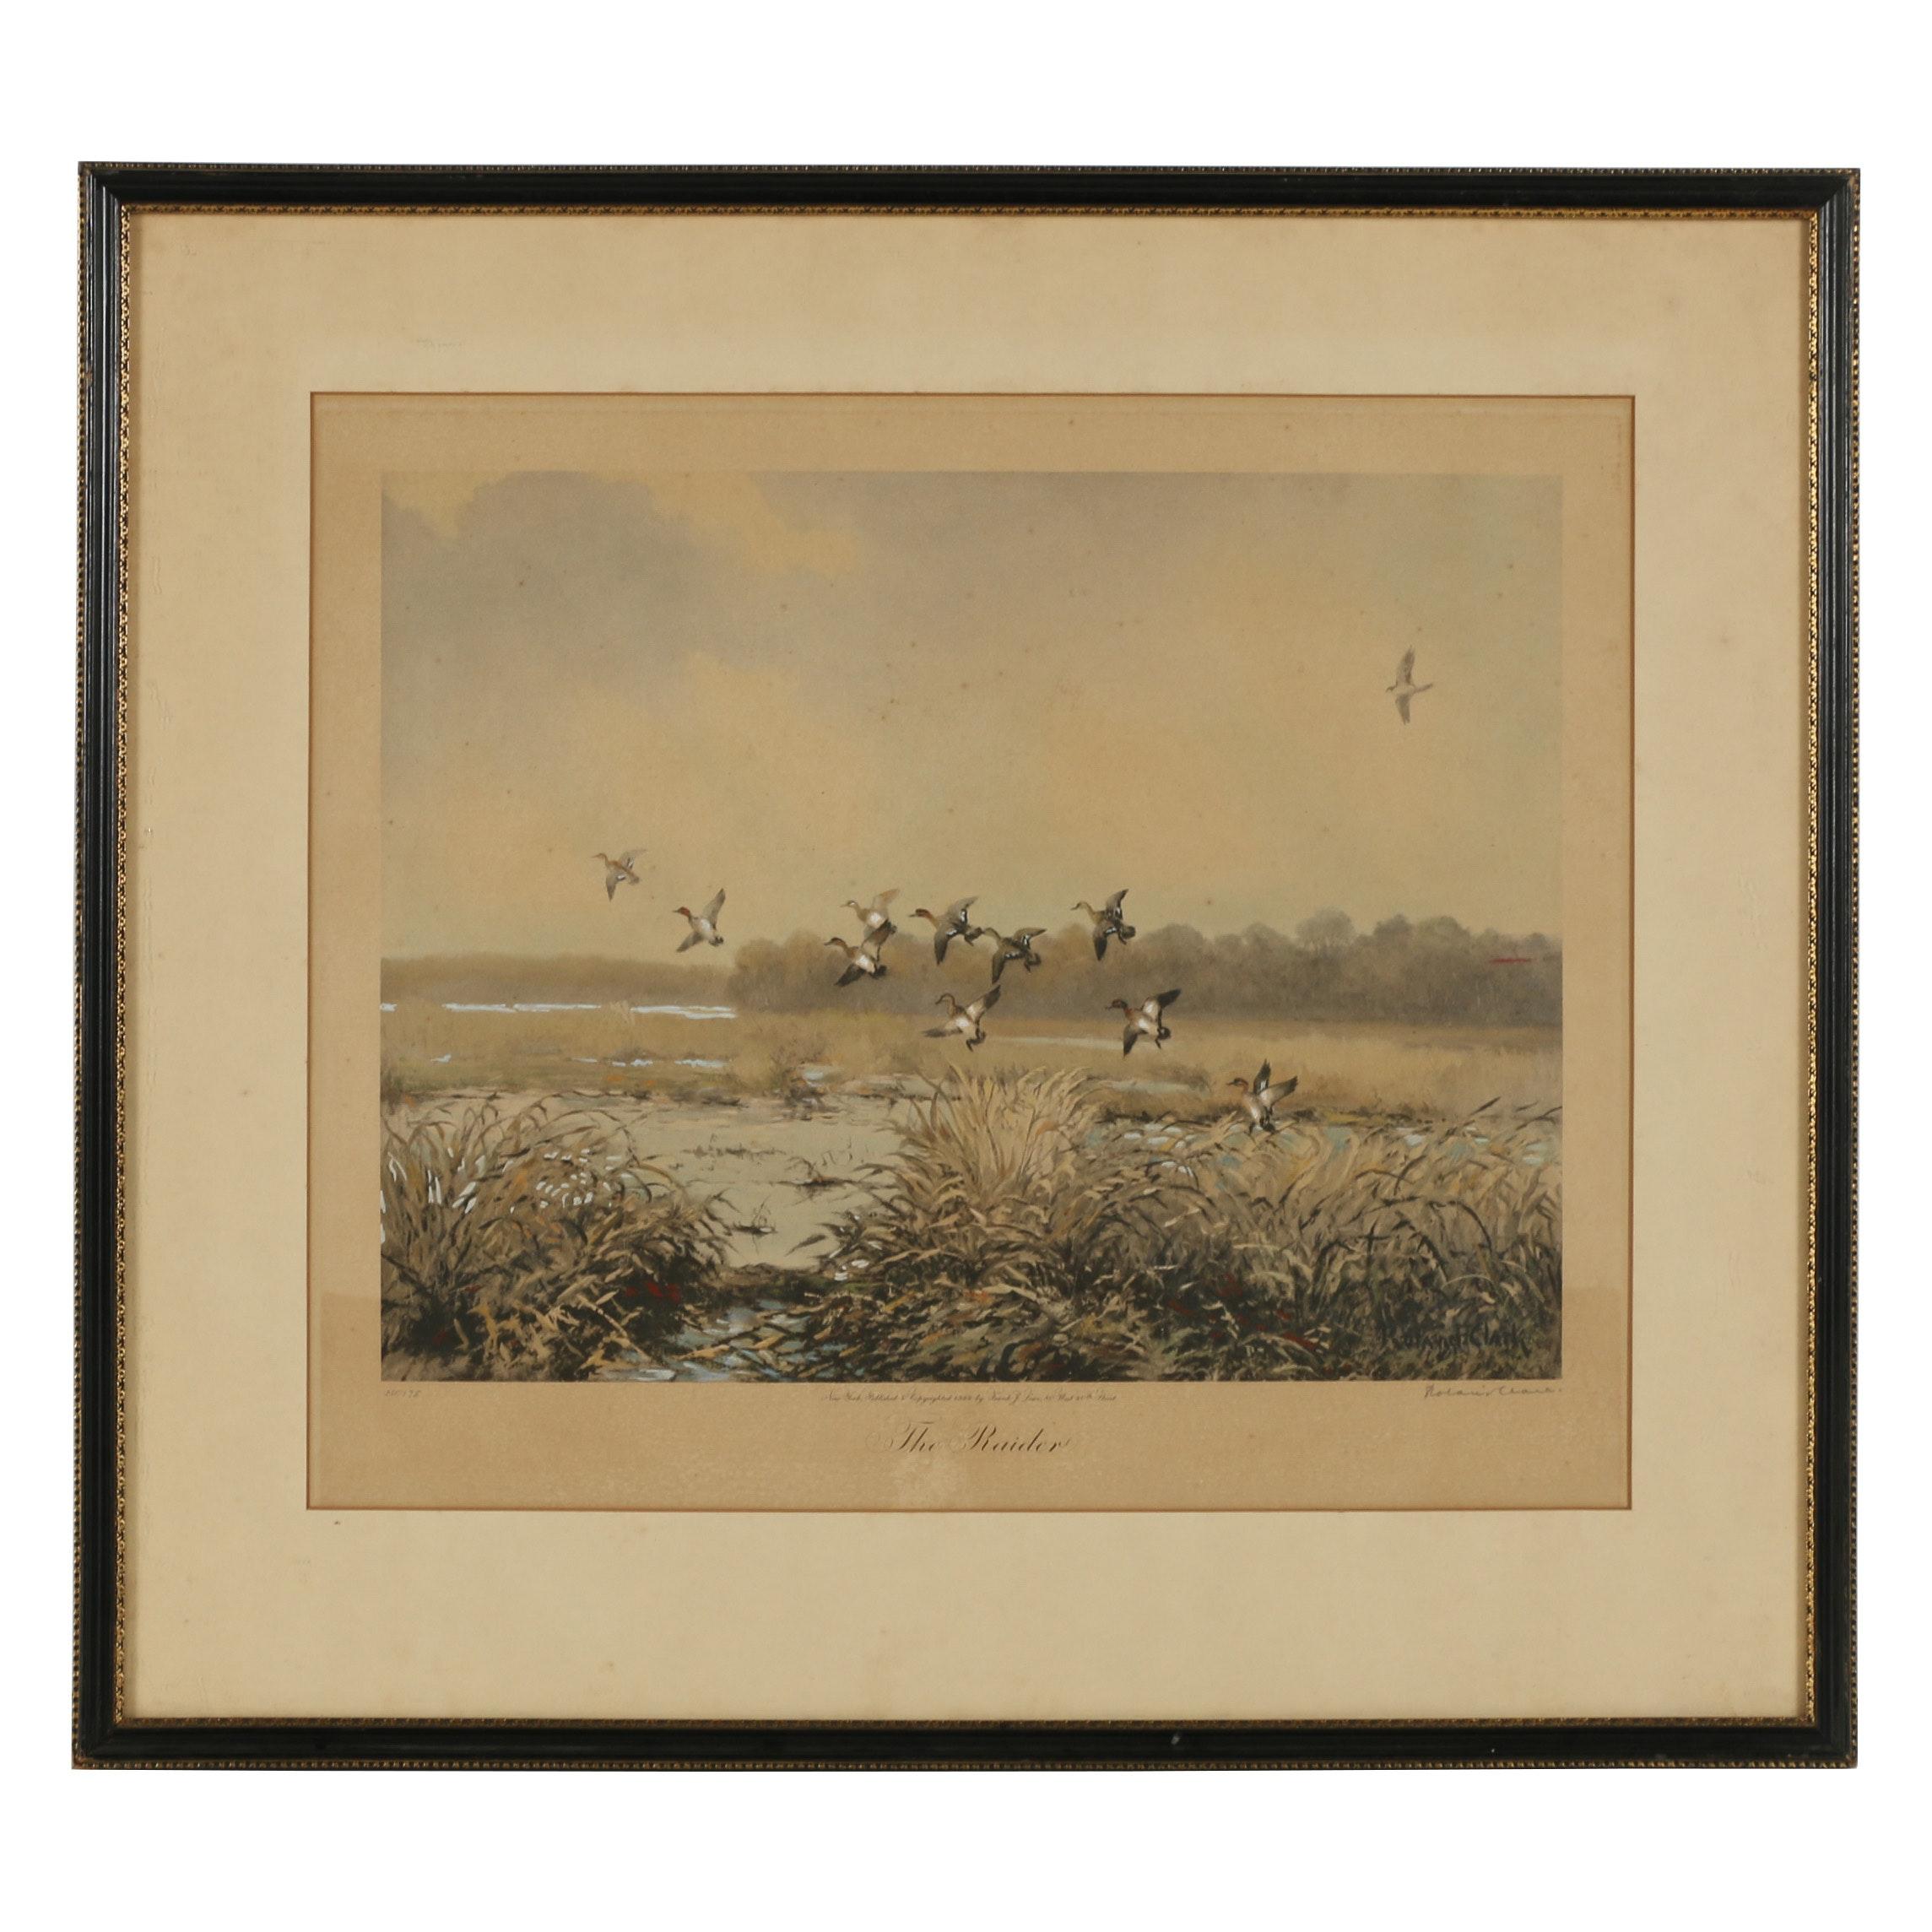 "Roland Clark Hand-Painted Photogravure ""The Raider"""